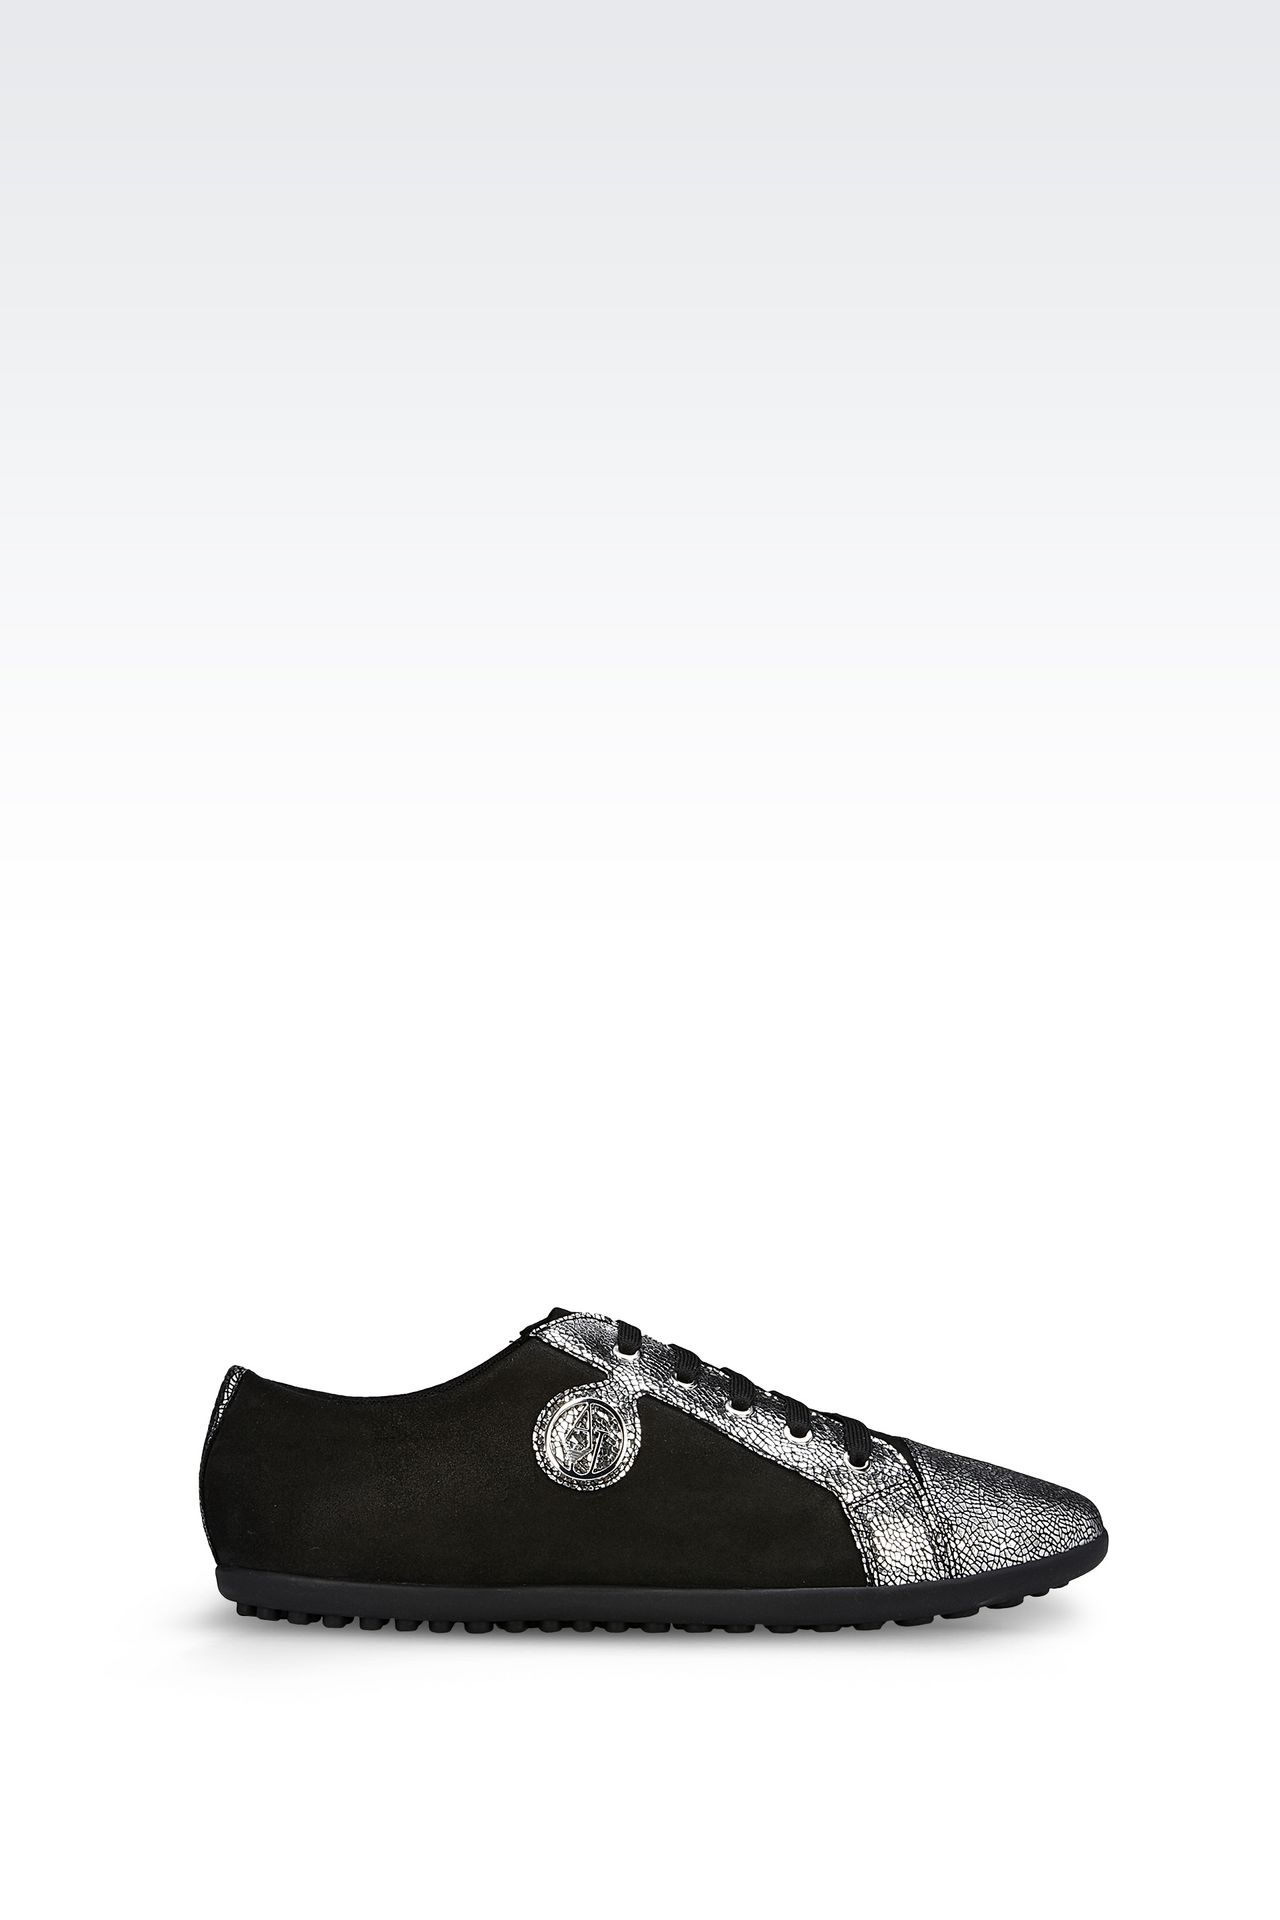 armani jeans women leather sneaker goatskin. Black Bedroom Furniture Sets. Home Design Ideas